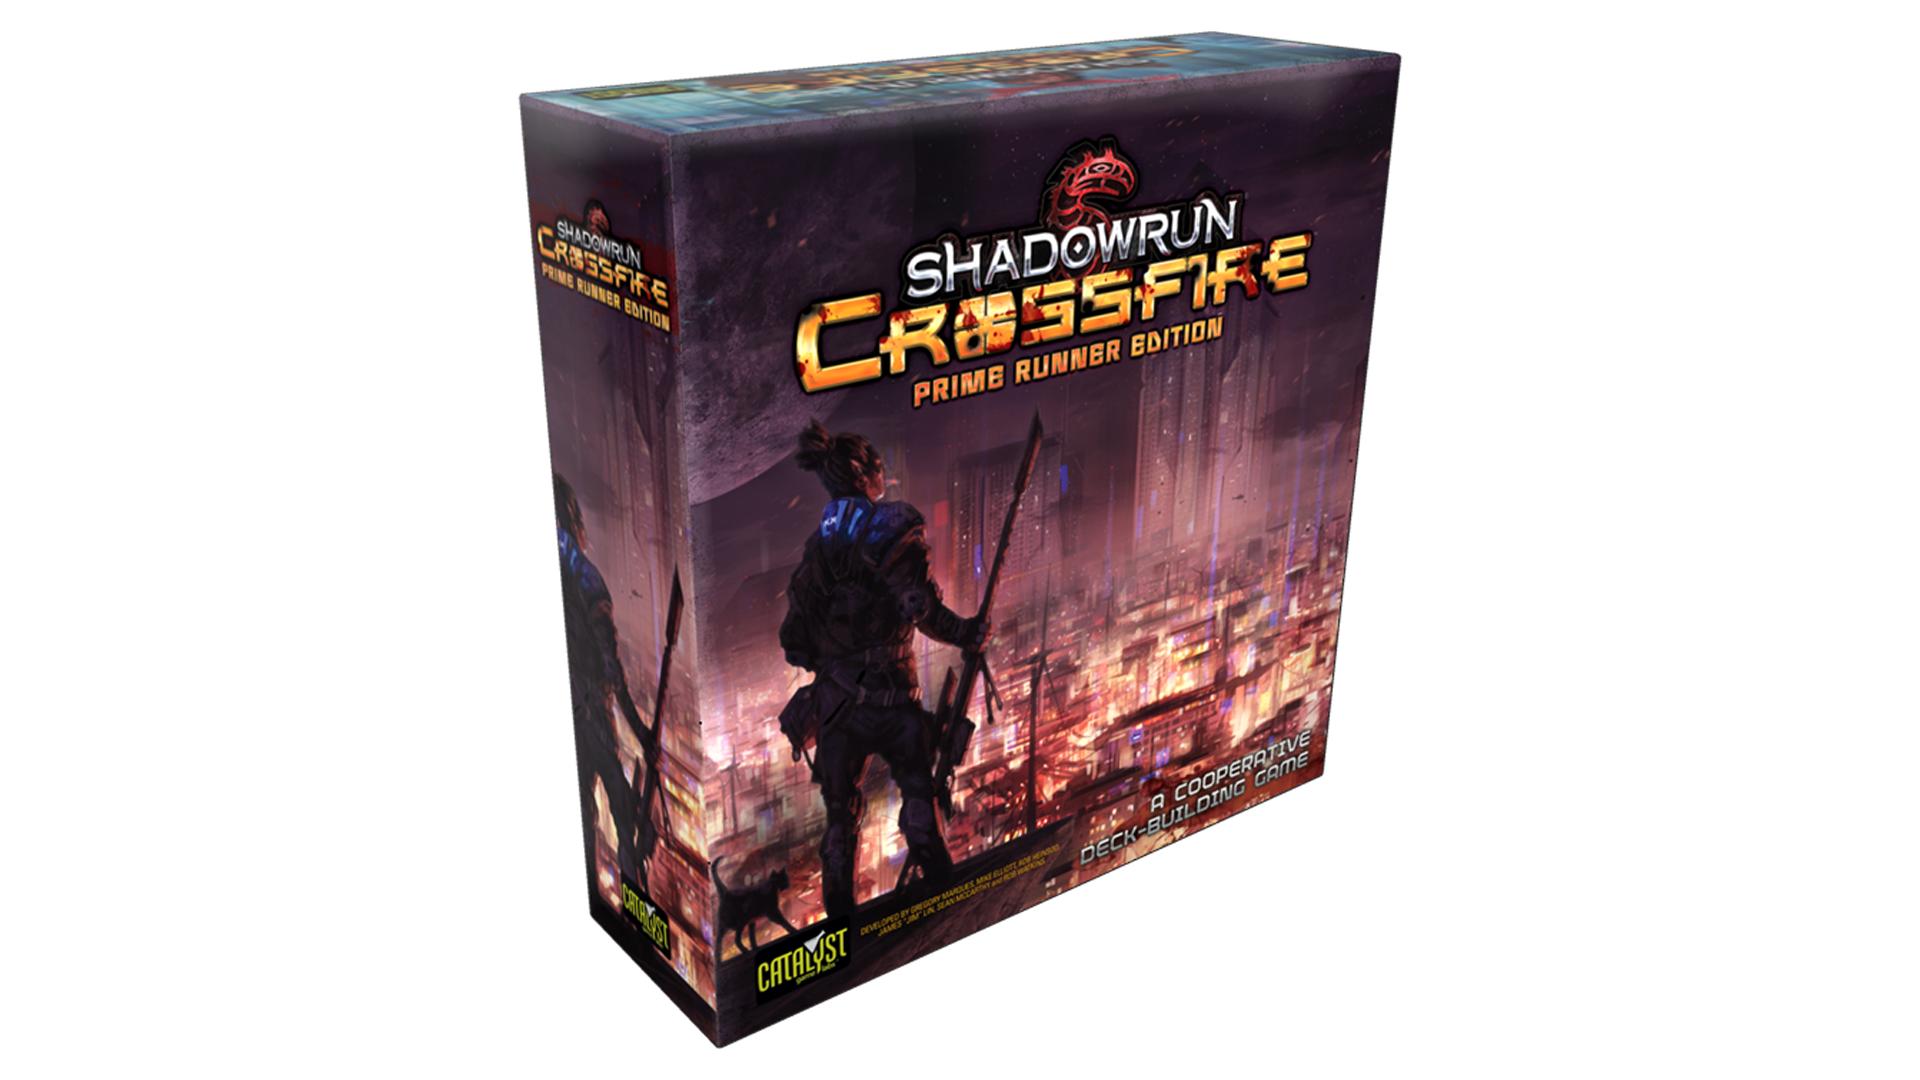 Shadowrun: Crossfire Prime Runner Edition legacy board game box